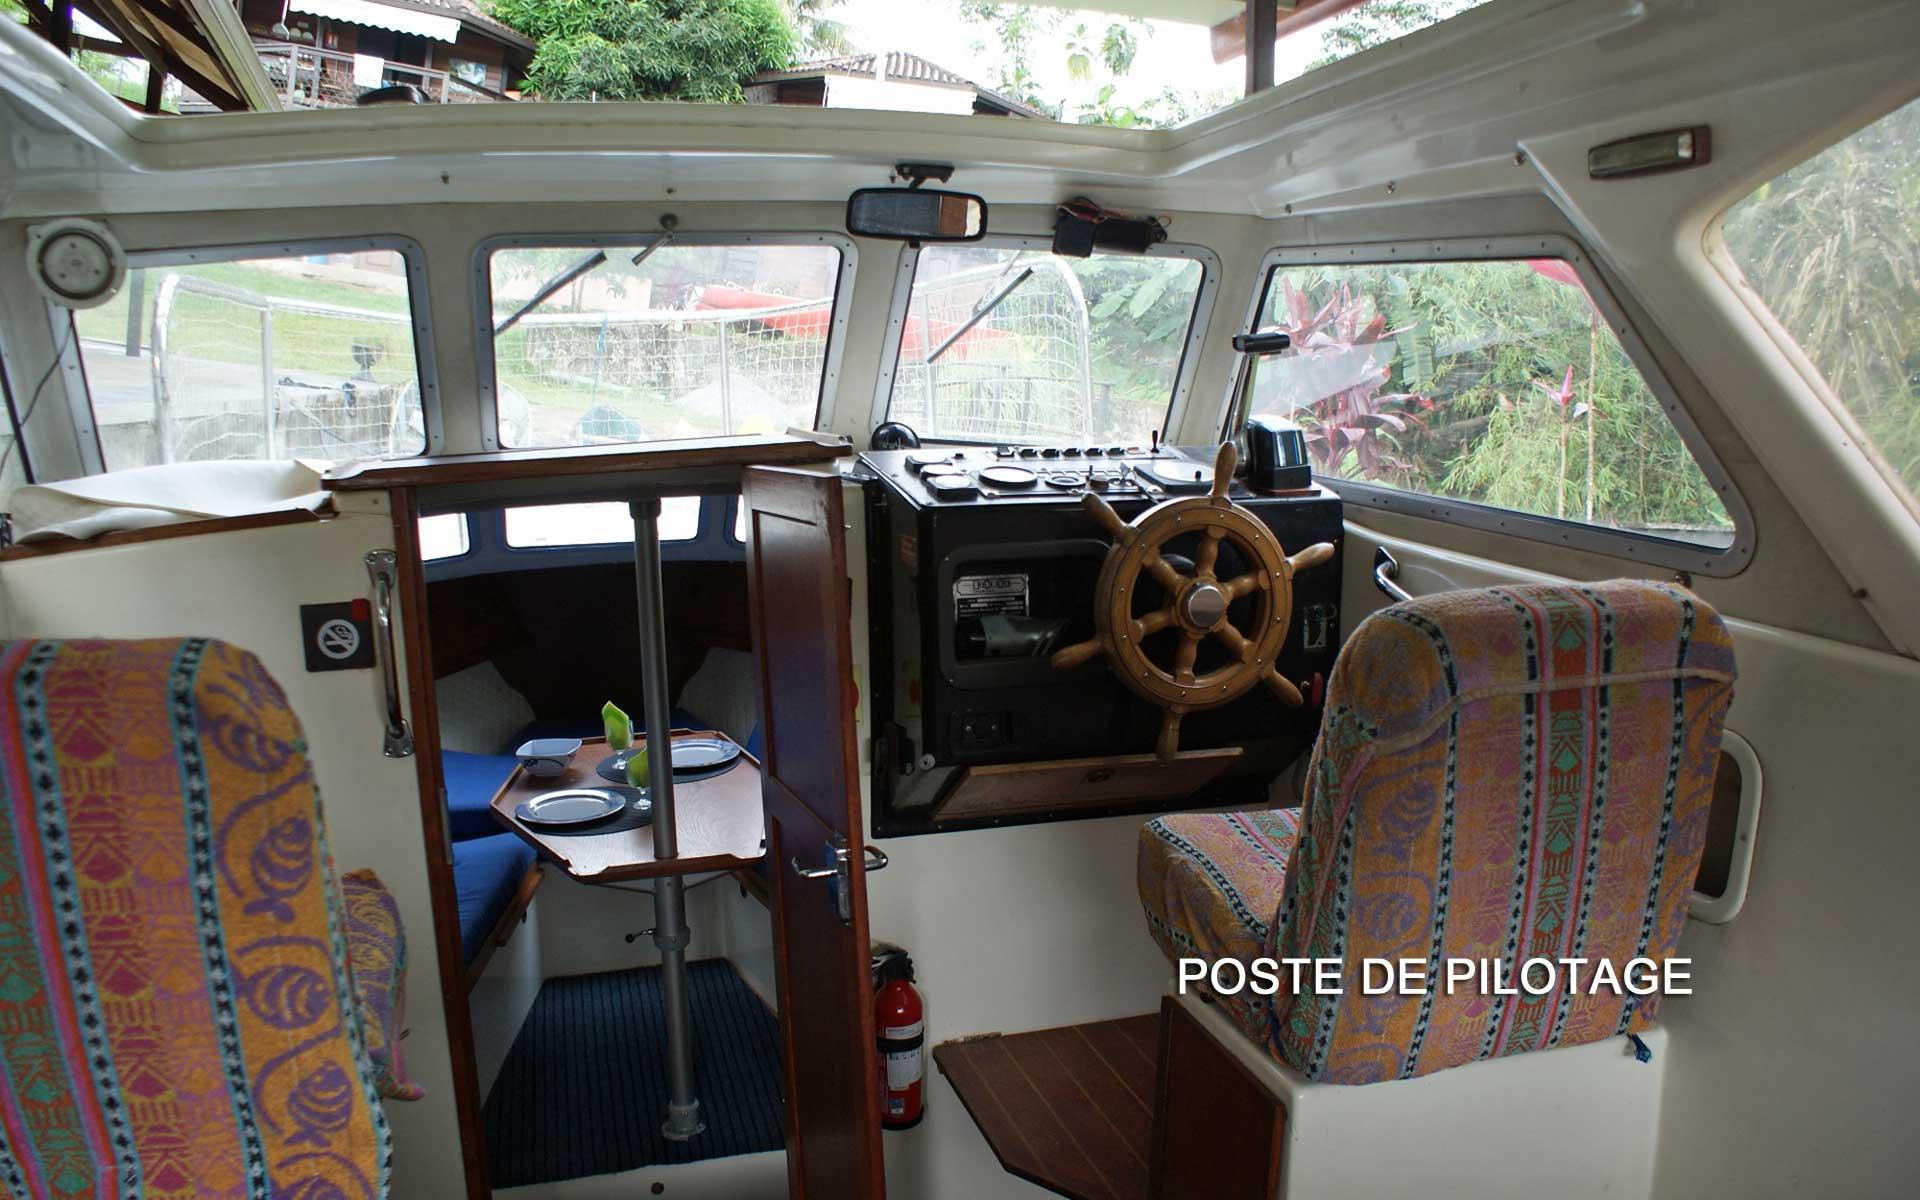 http://www.location-guyane.fr/wp-content/uploads/2015/04/RONA-pilotage.jpg